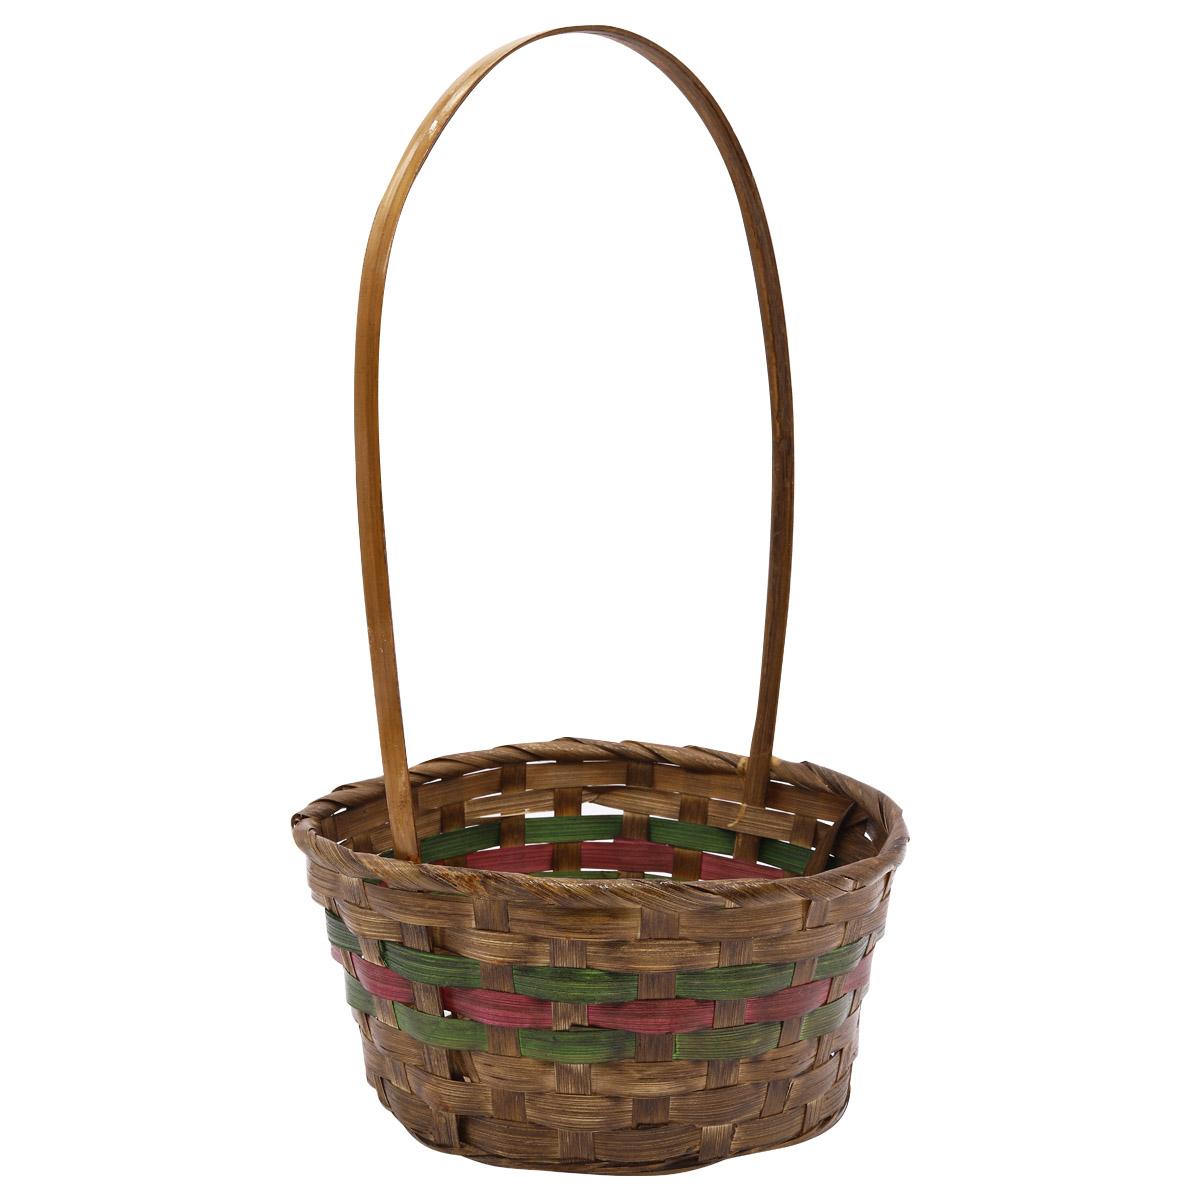 19HJ19093 Корзина плетеная бамбук 'M' 20,5*10,5*H35см, цв. коричневый Астра